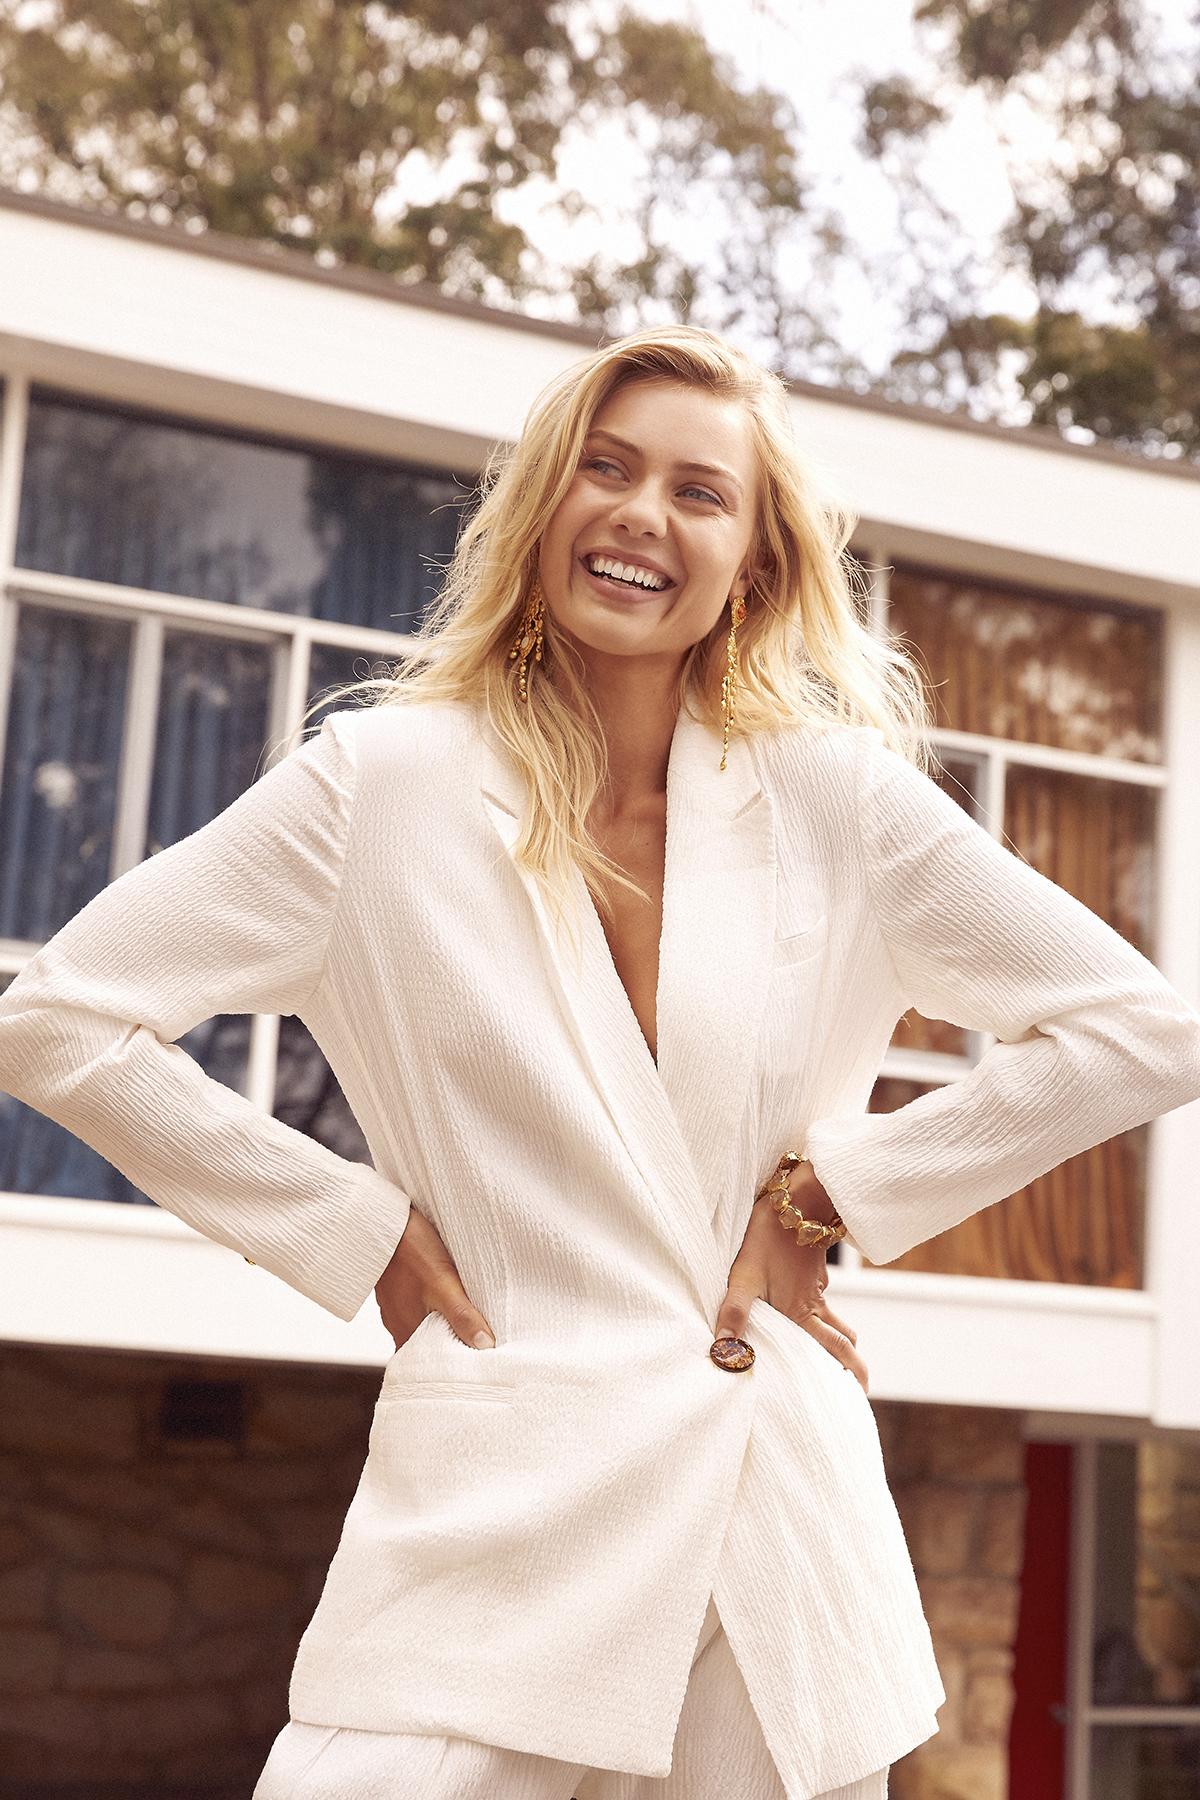 Elyse Knowles STM Perth September 16th 2018 5.jpg